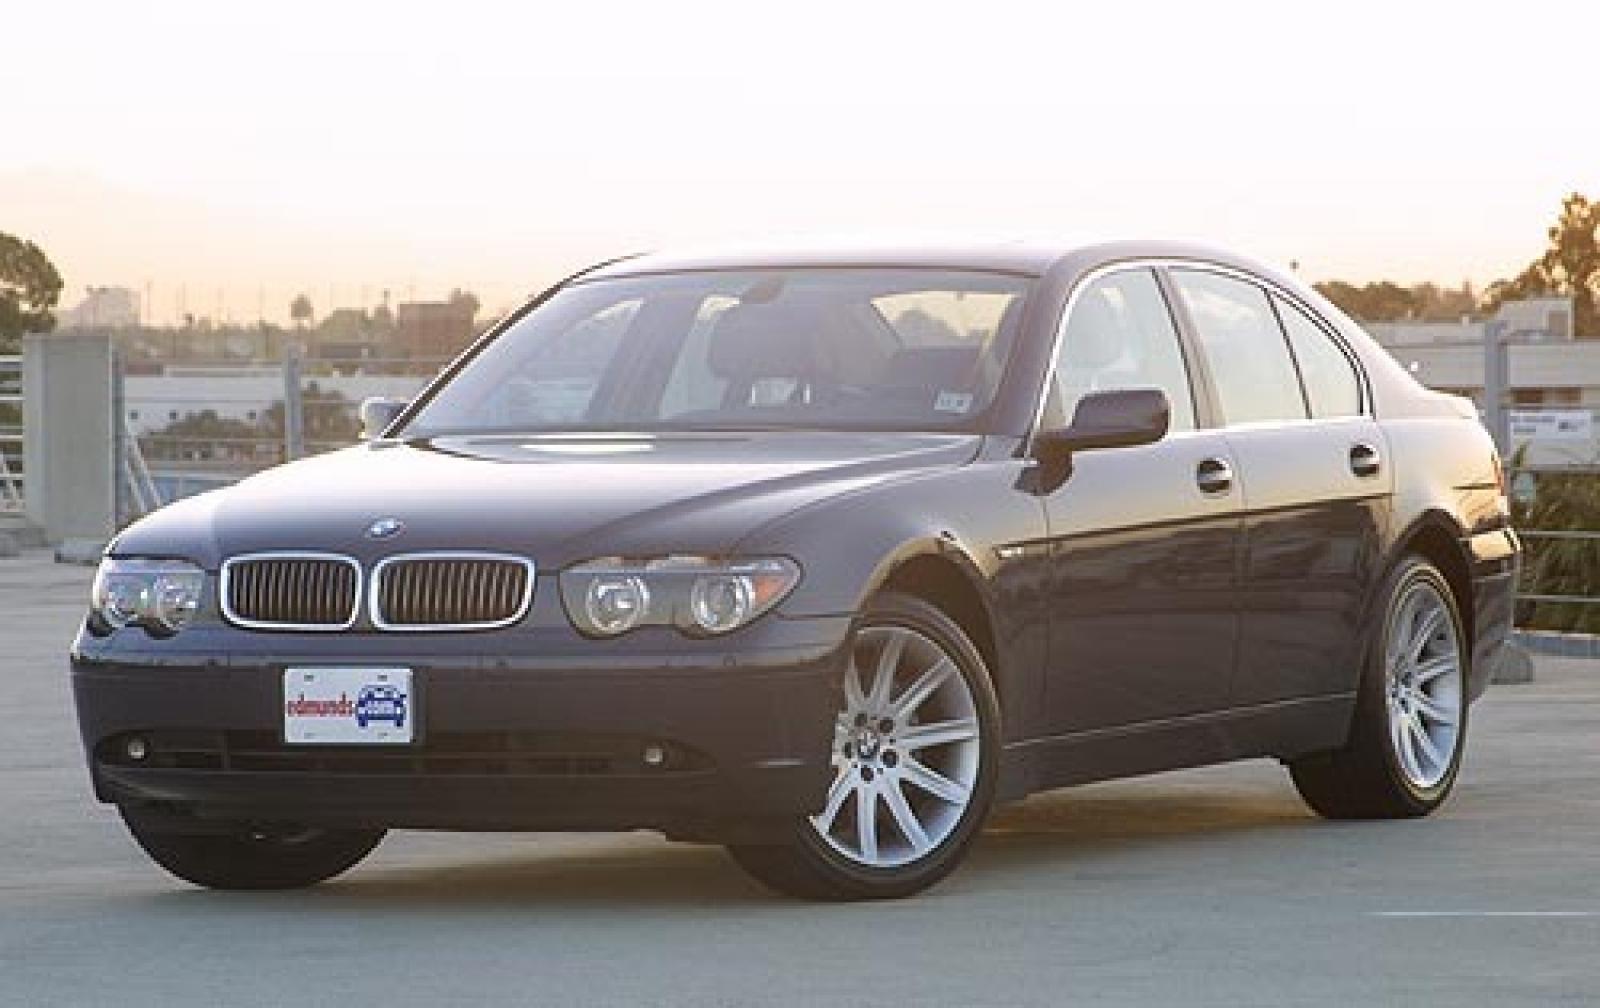 2002 BMW 7 Series 745i En Interior 2 800 1024 1280 1600 Origin